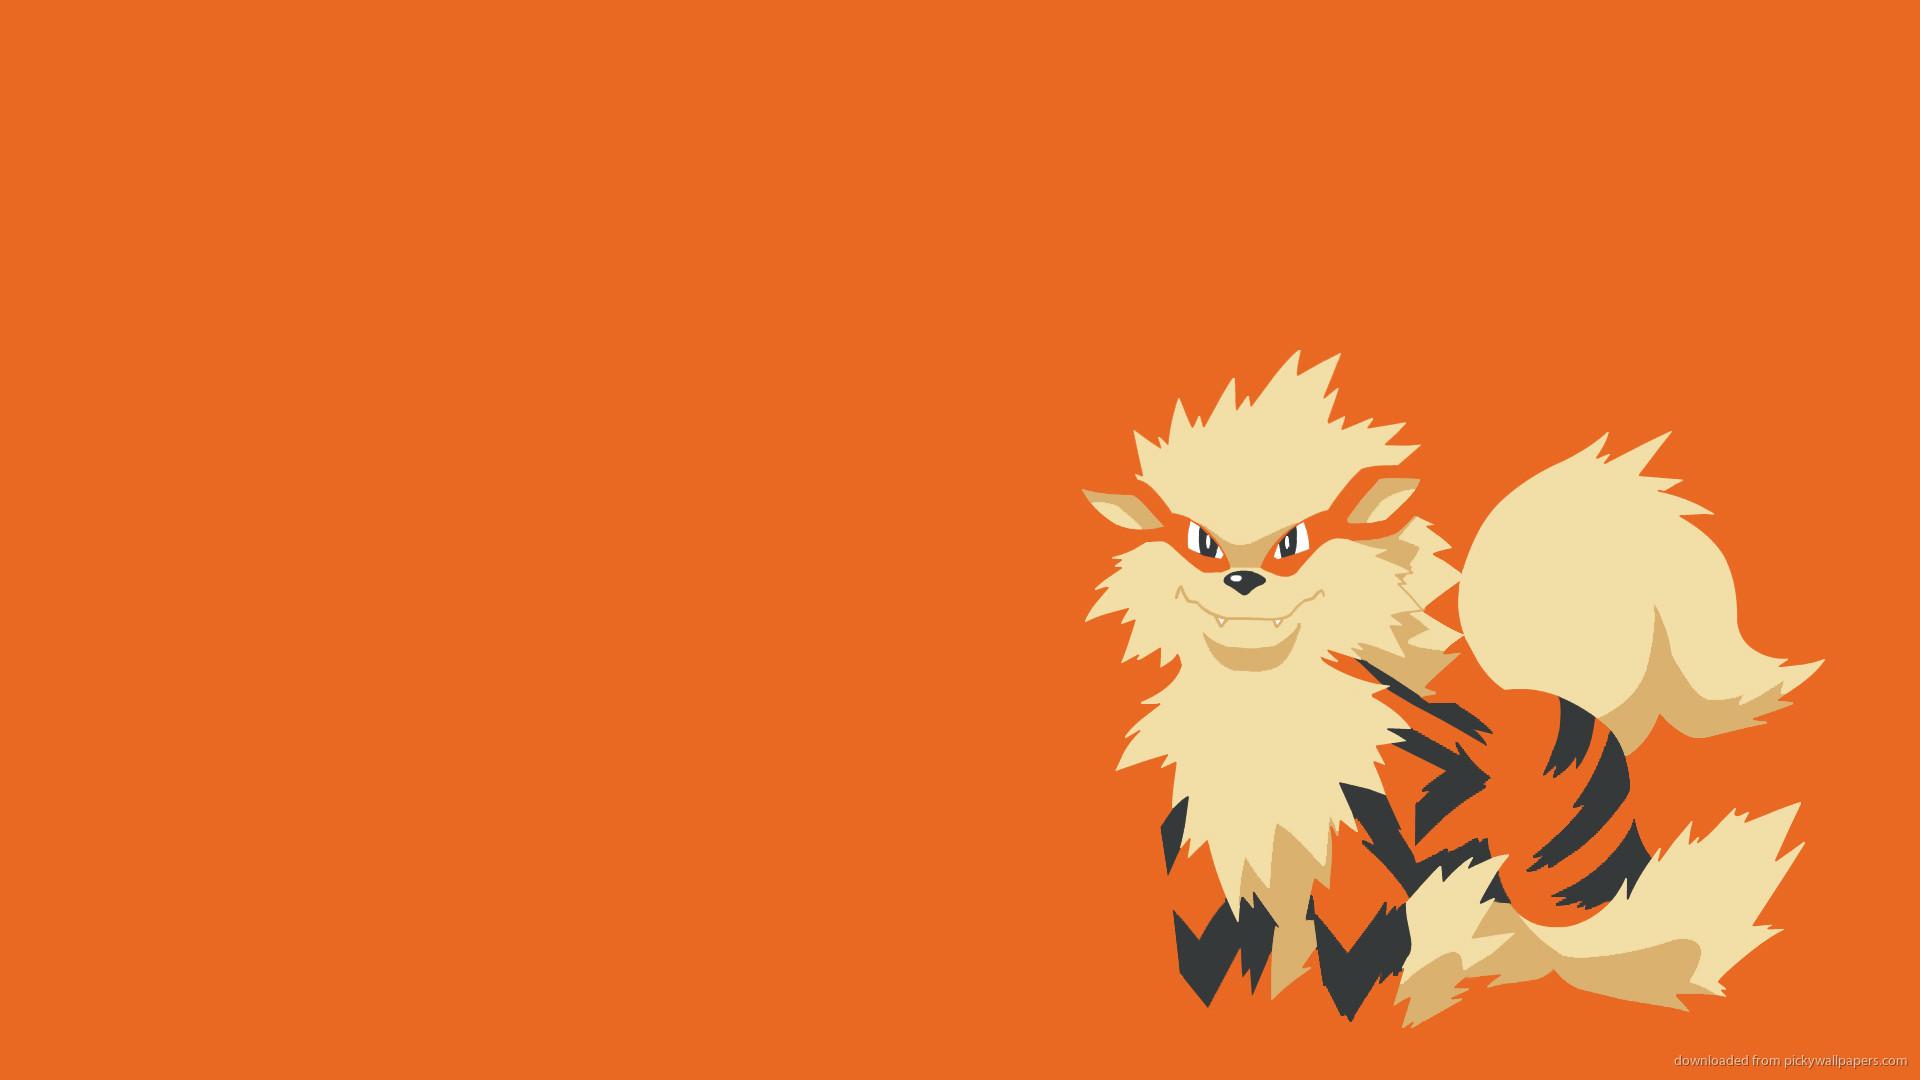 Arcanine Pokemon Wallpaper picture